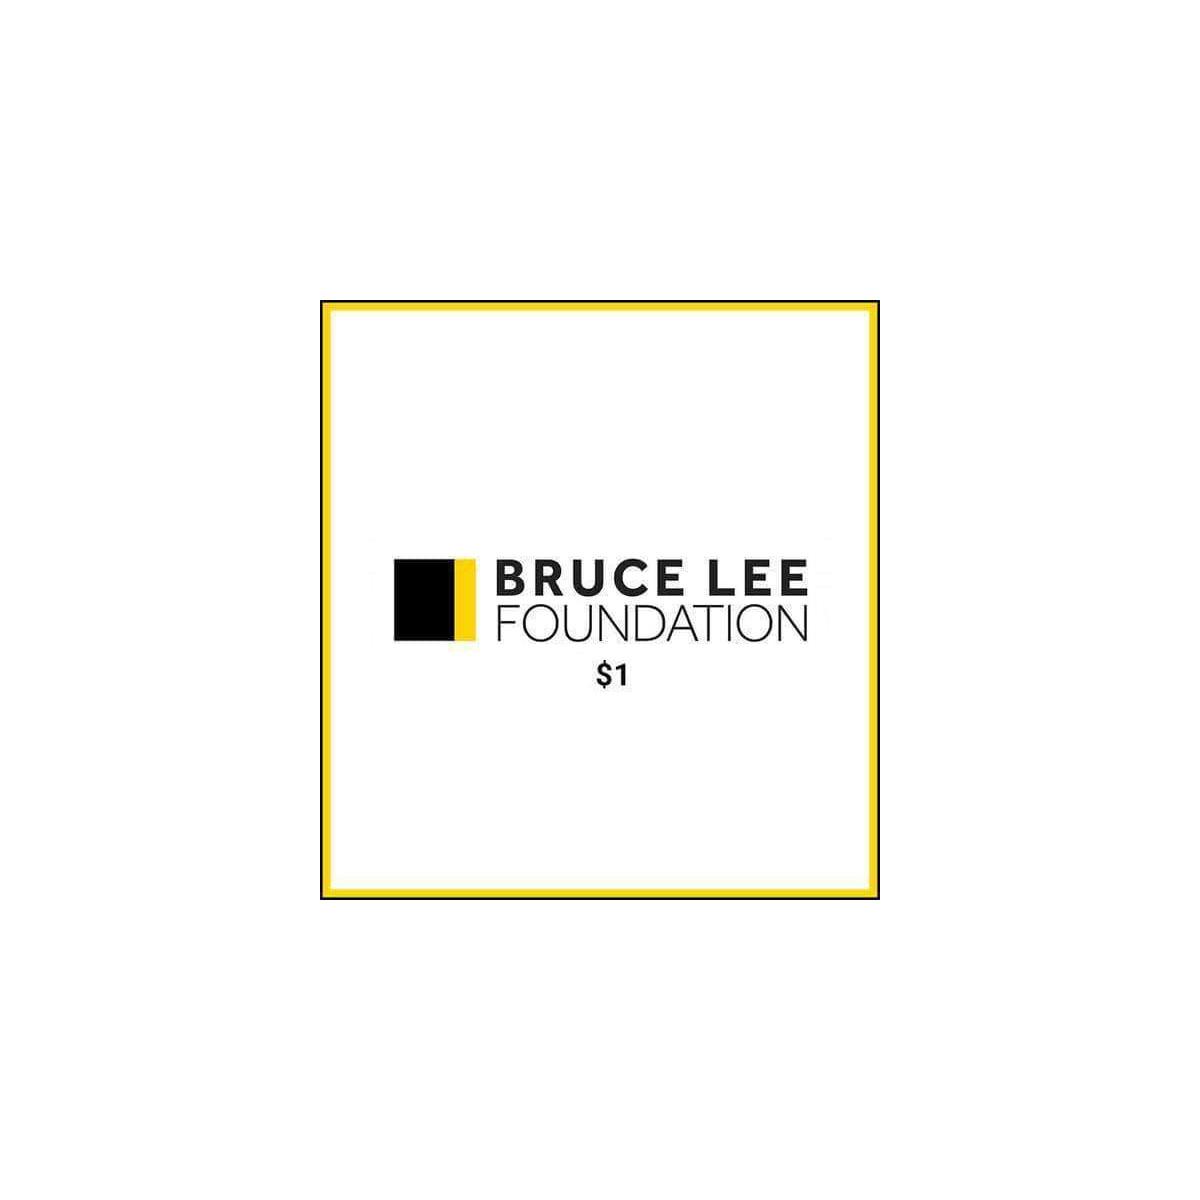 Bruce Lee Foundation $1 Donation